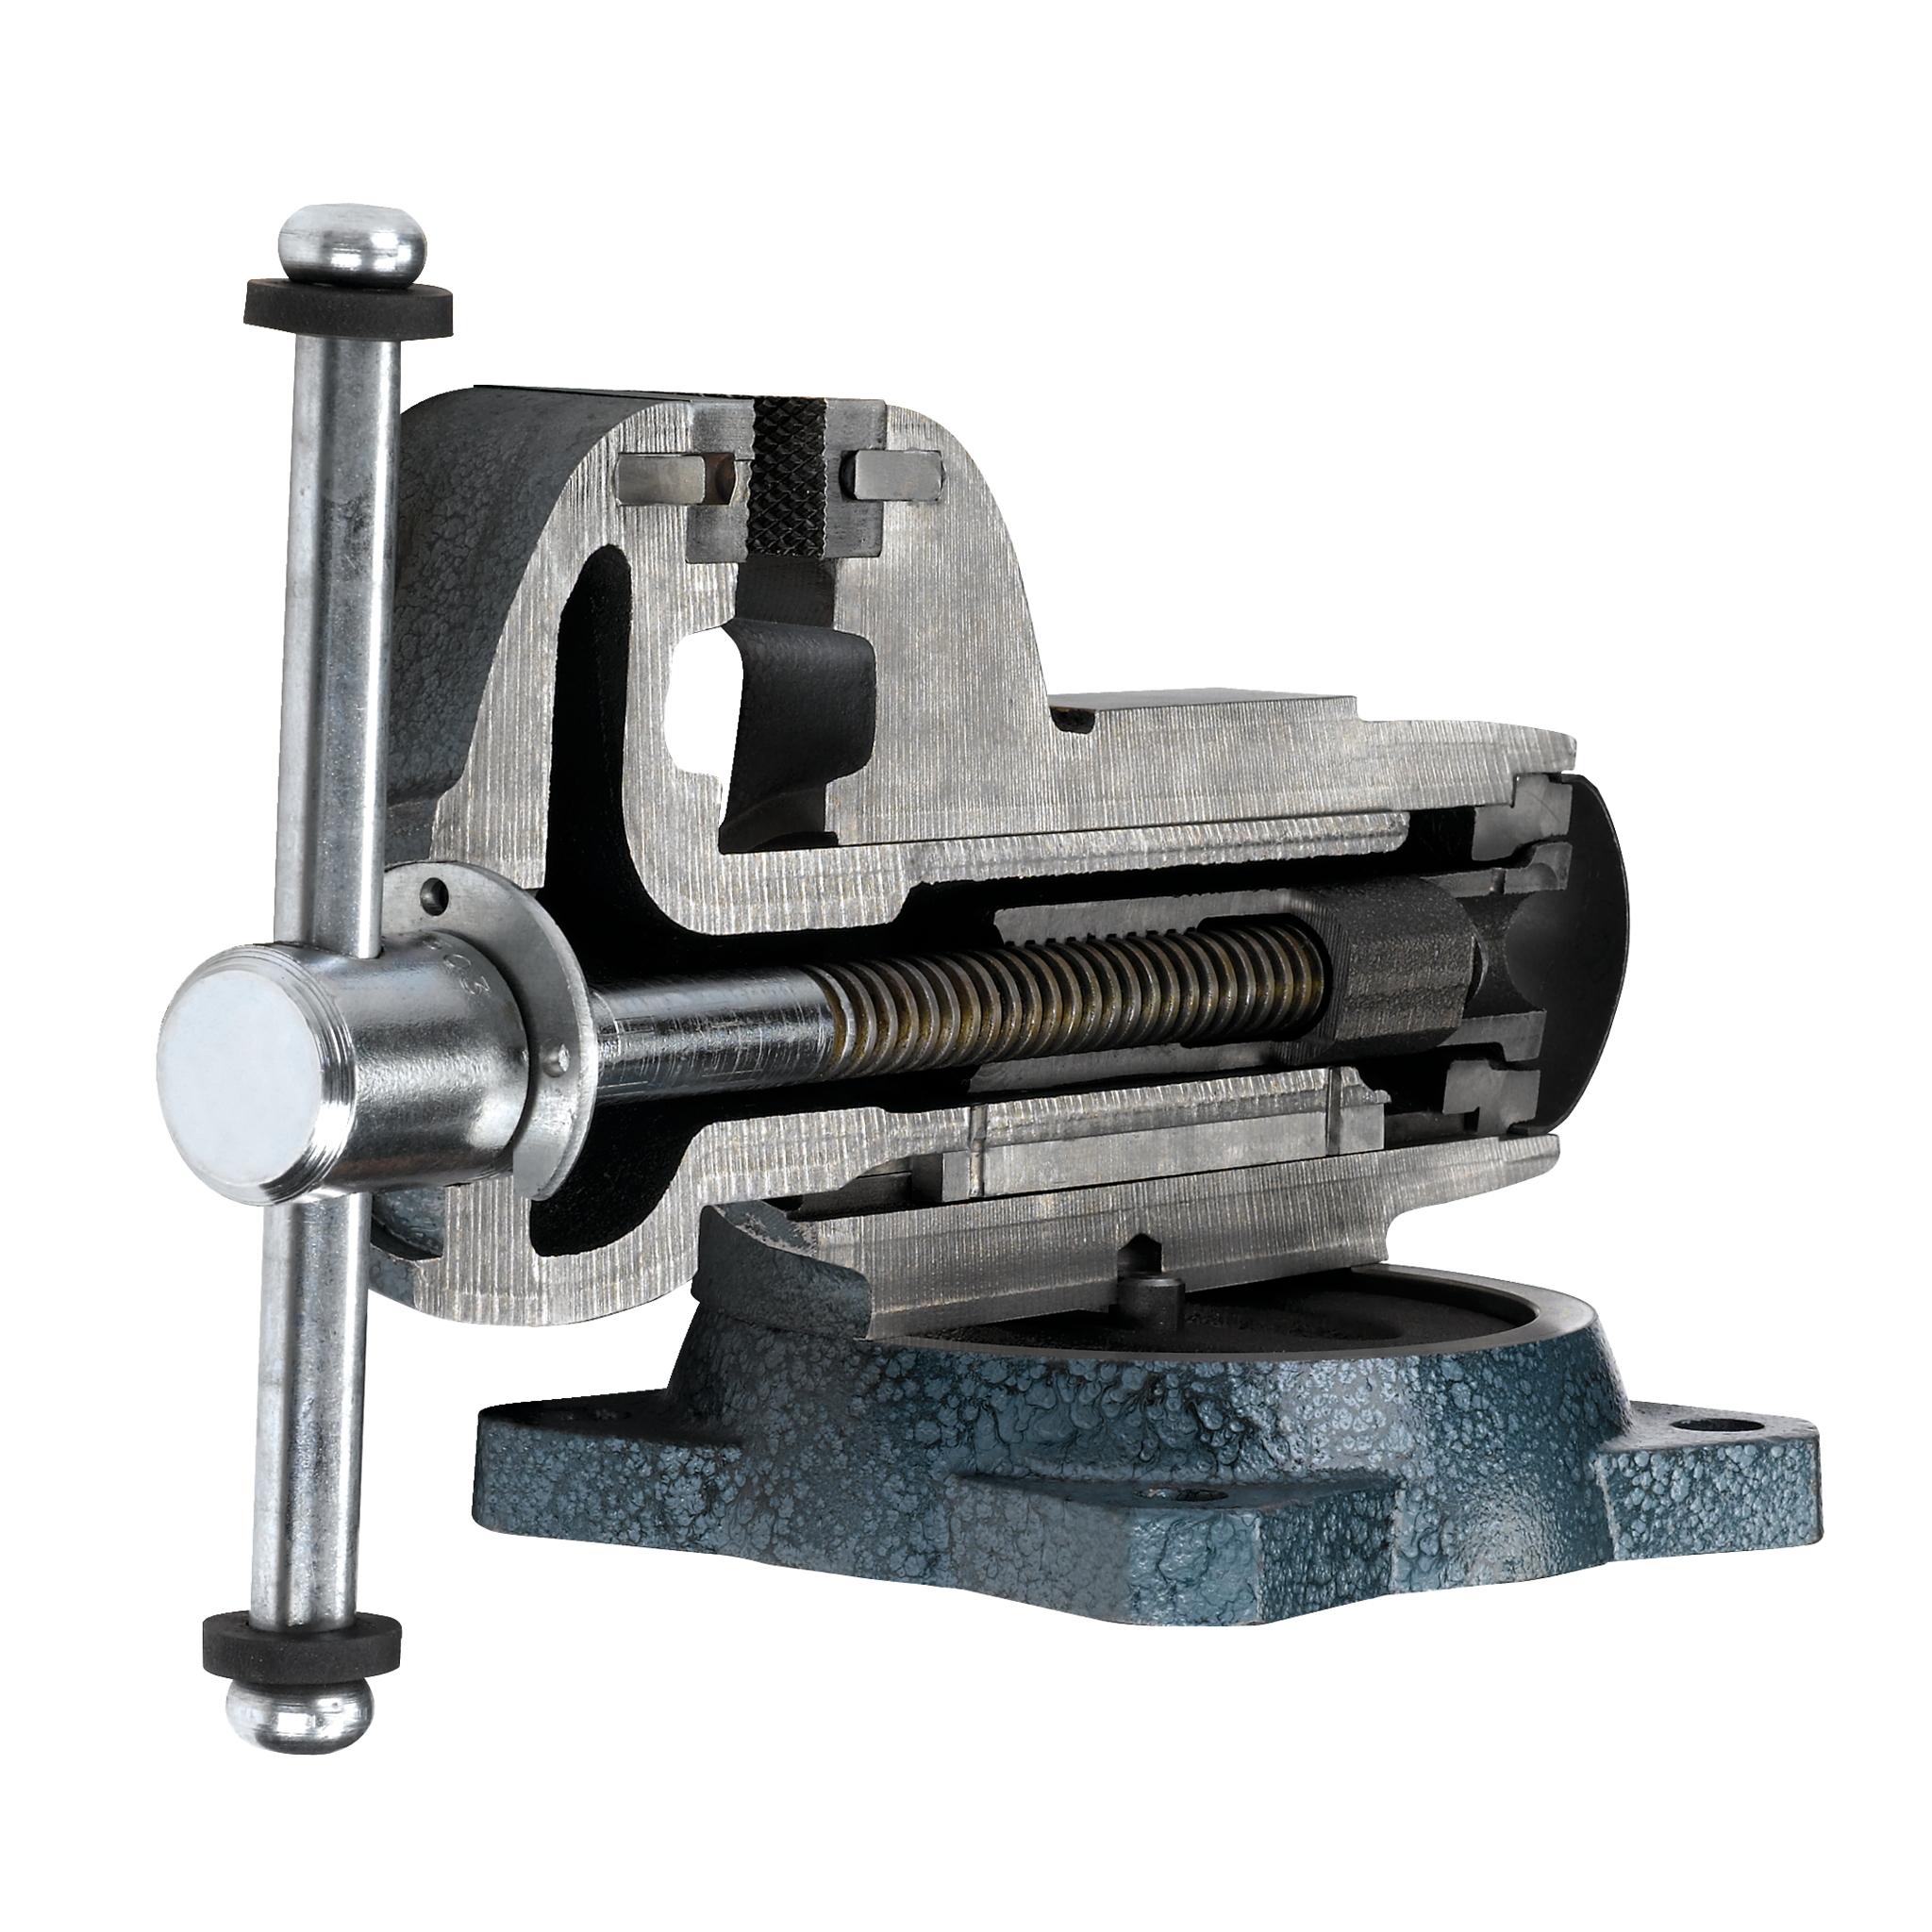 Wilton Vise 63201 1765 Tradesman Vise Elite Metal Tools